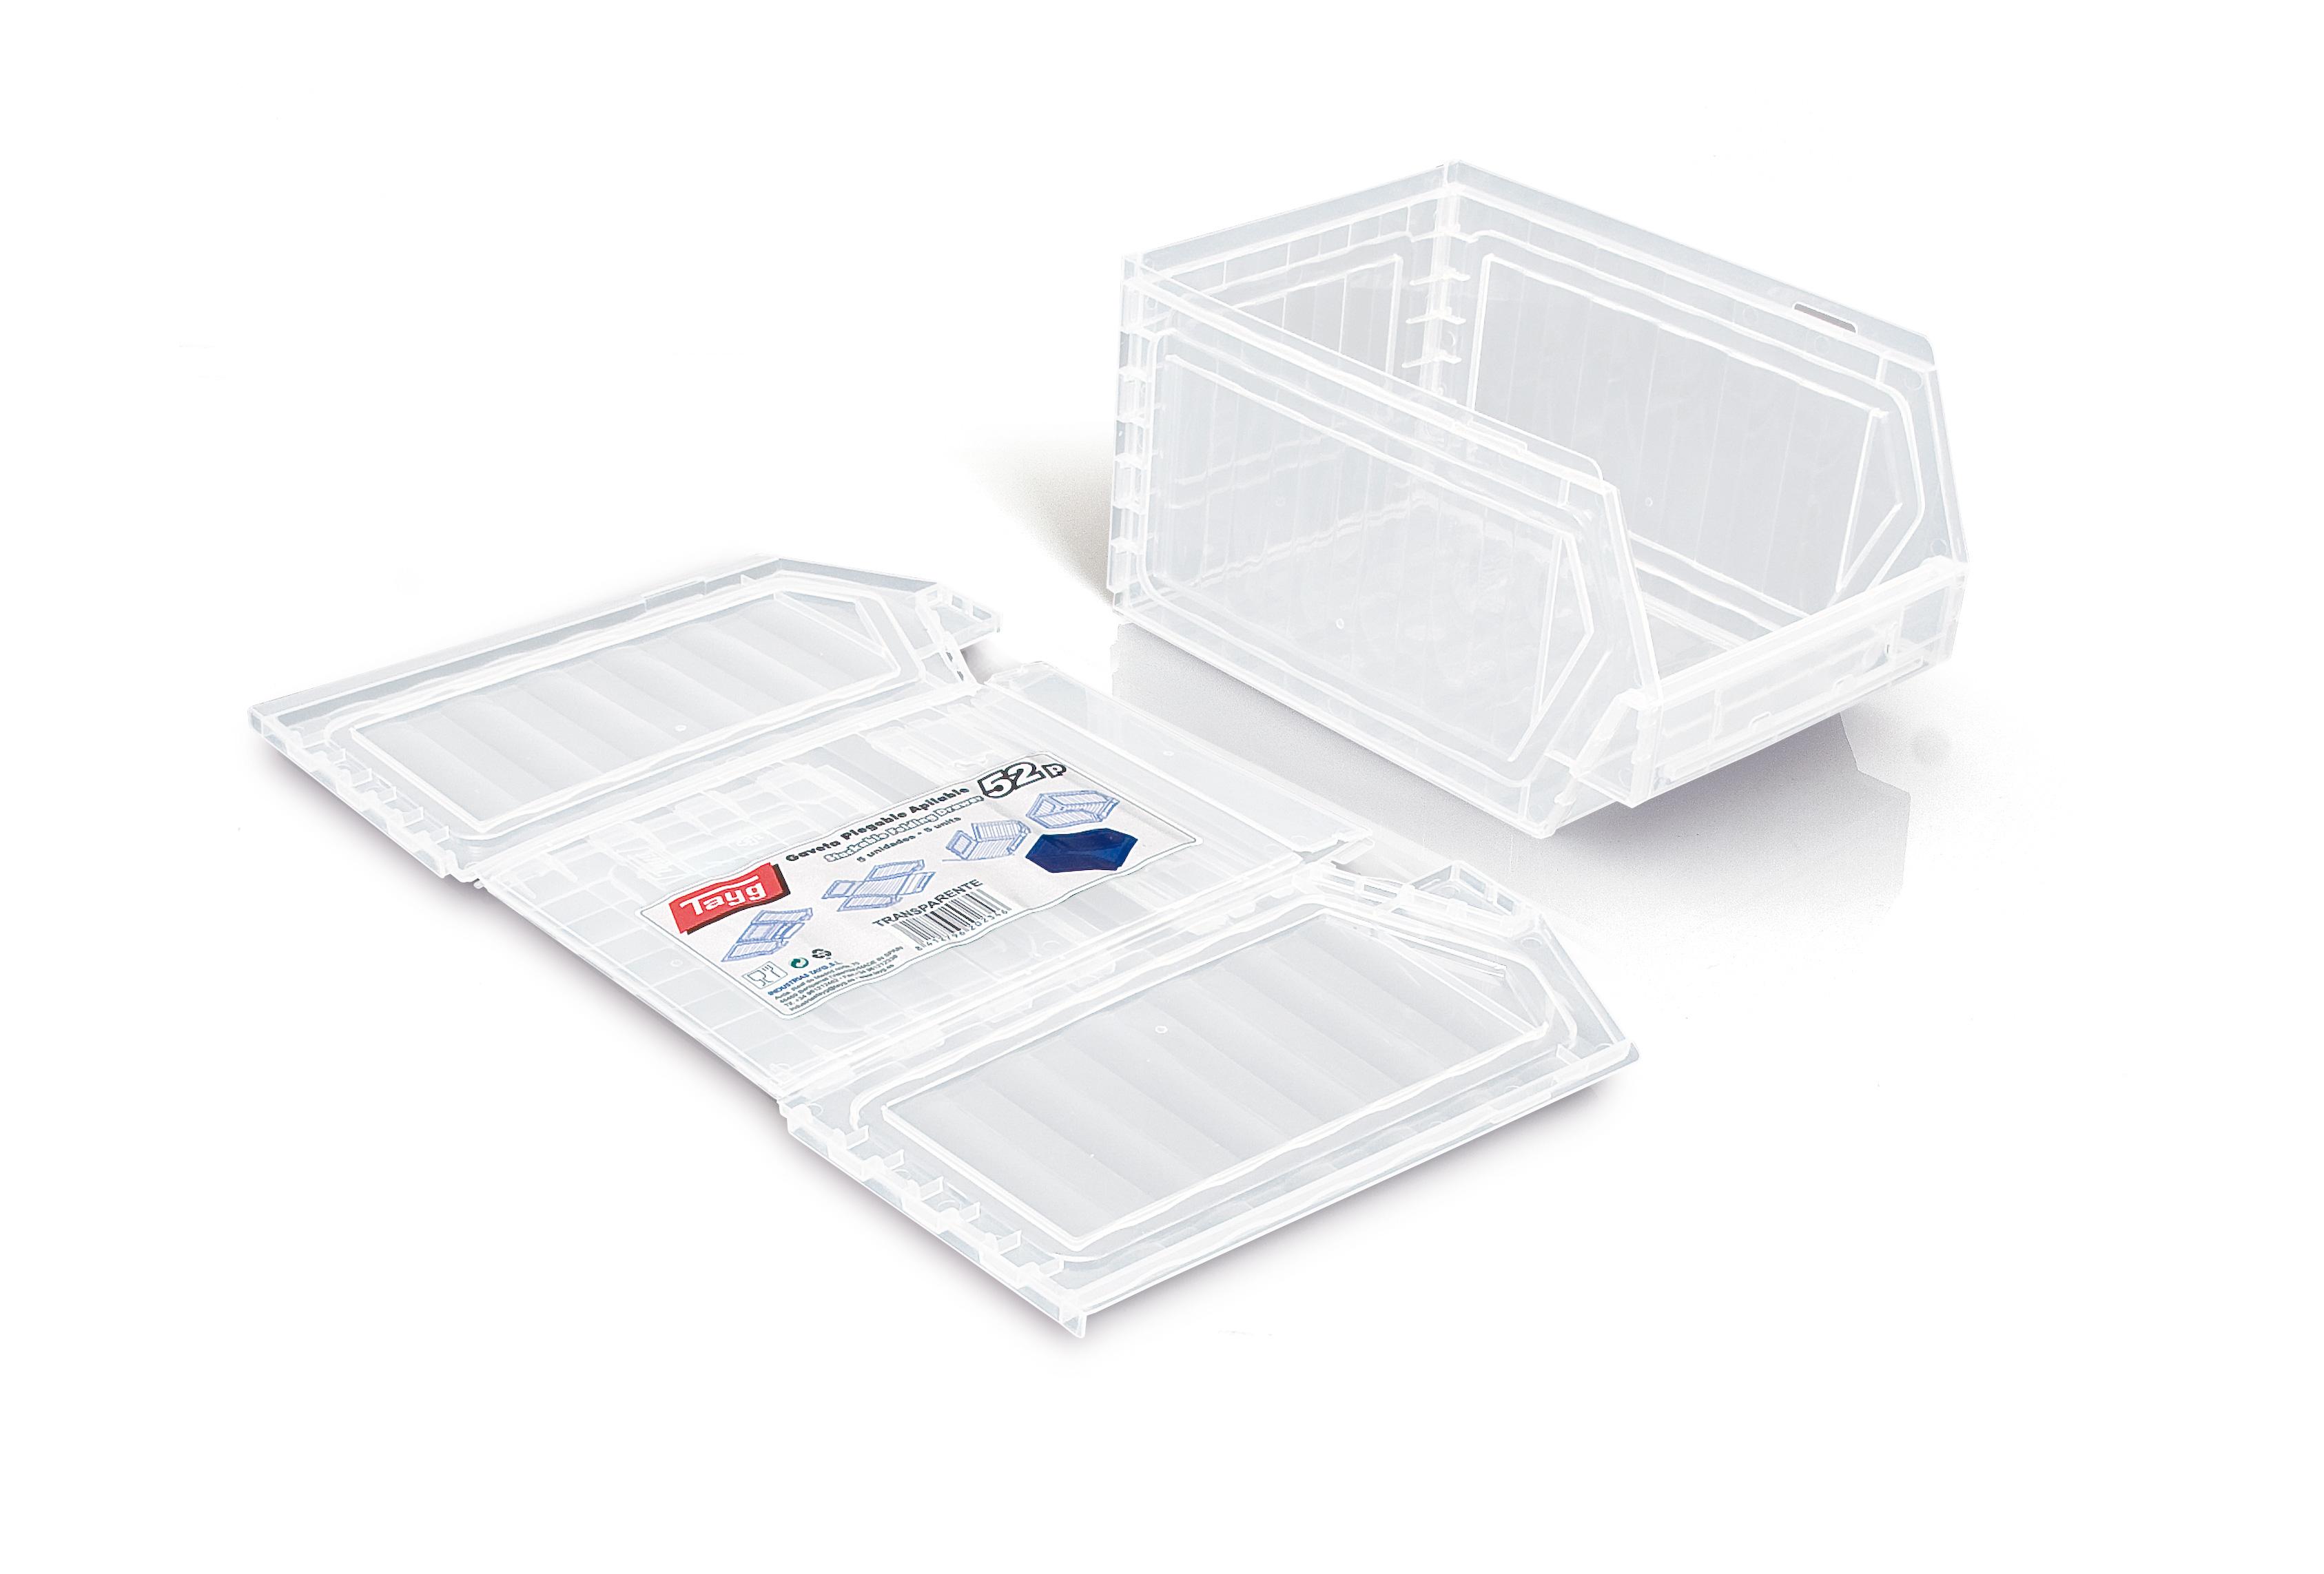 2 gaveta plegable apilable - Gavetas de plástico apilables